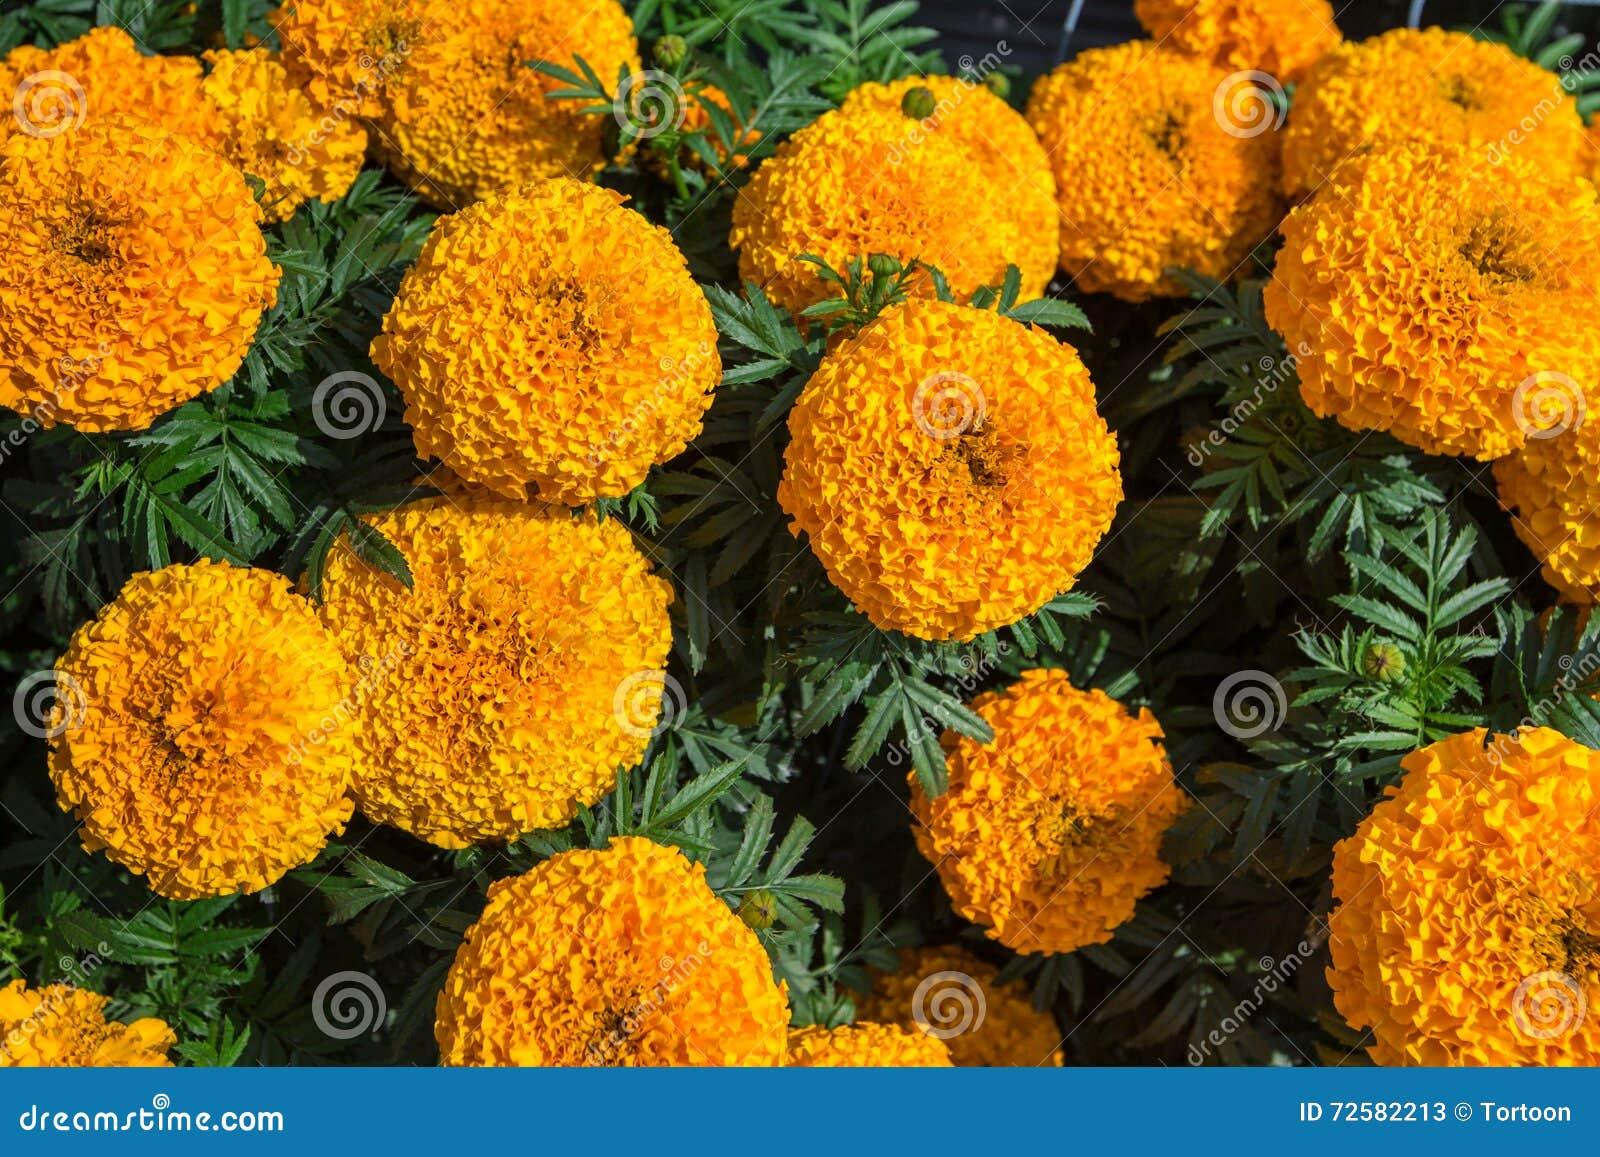 Yellow marigold flower plant stock image image of natural beauty yellow marigold flower plant mightylinksfo